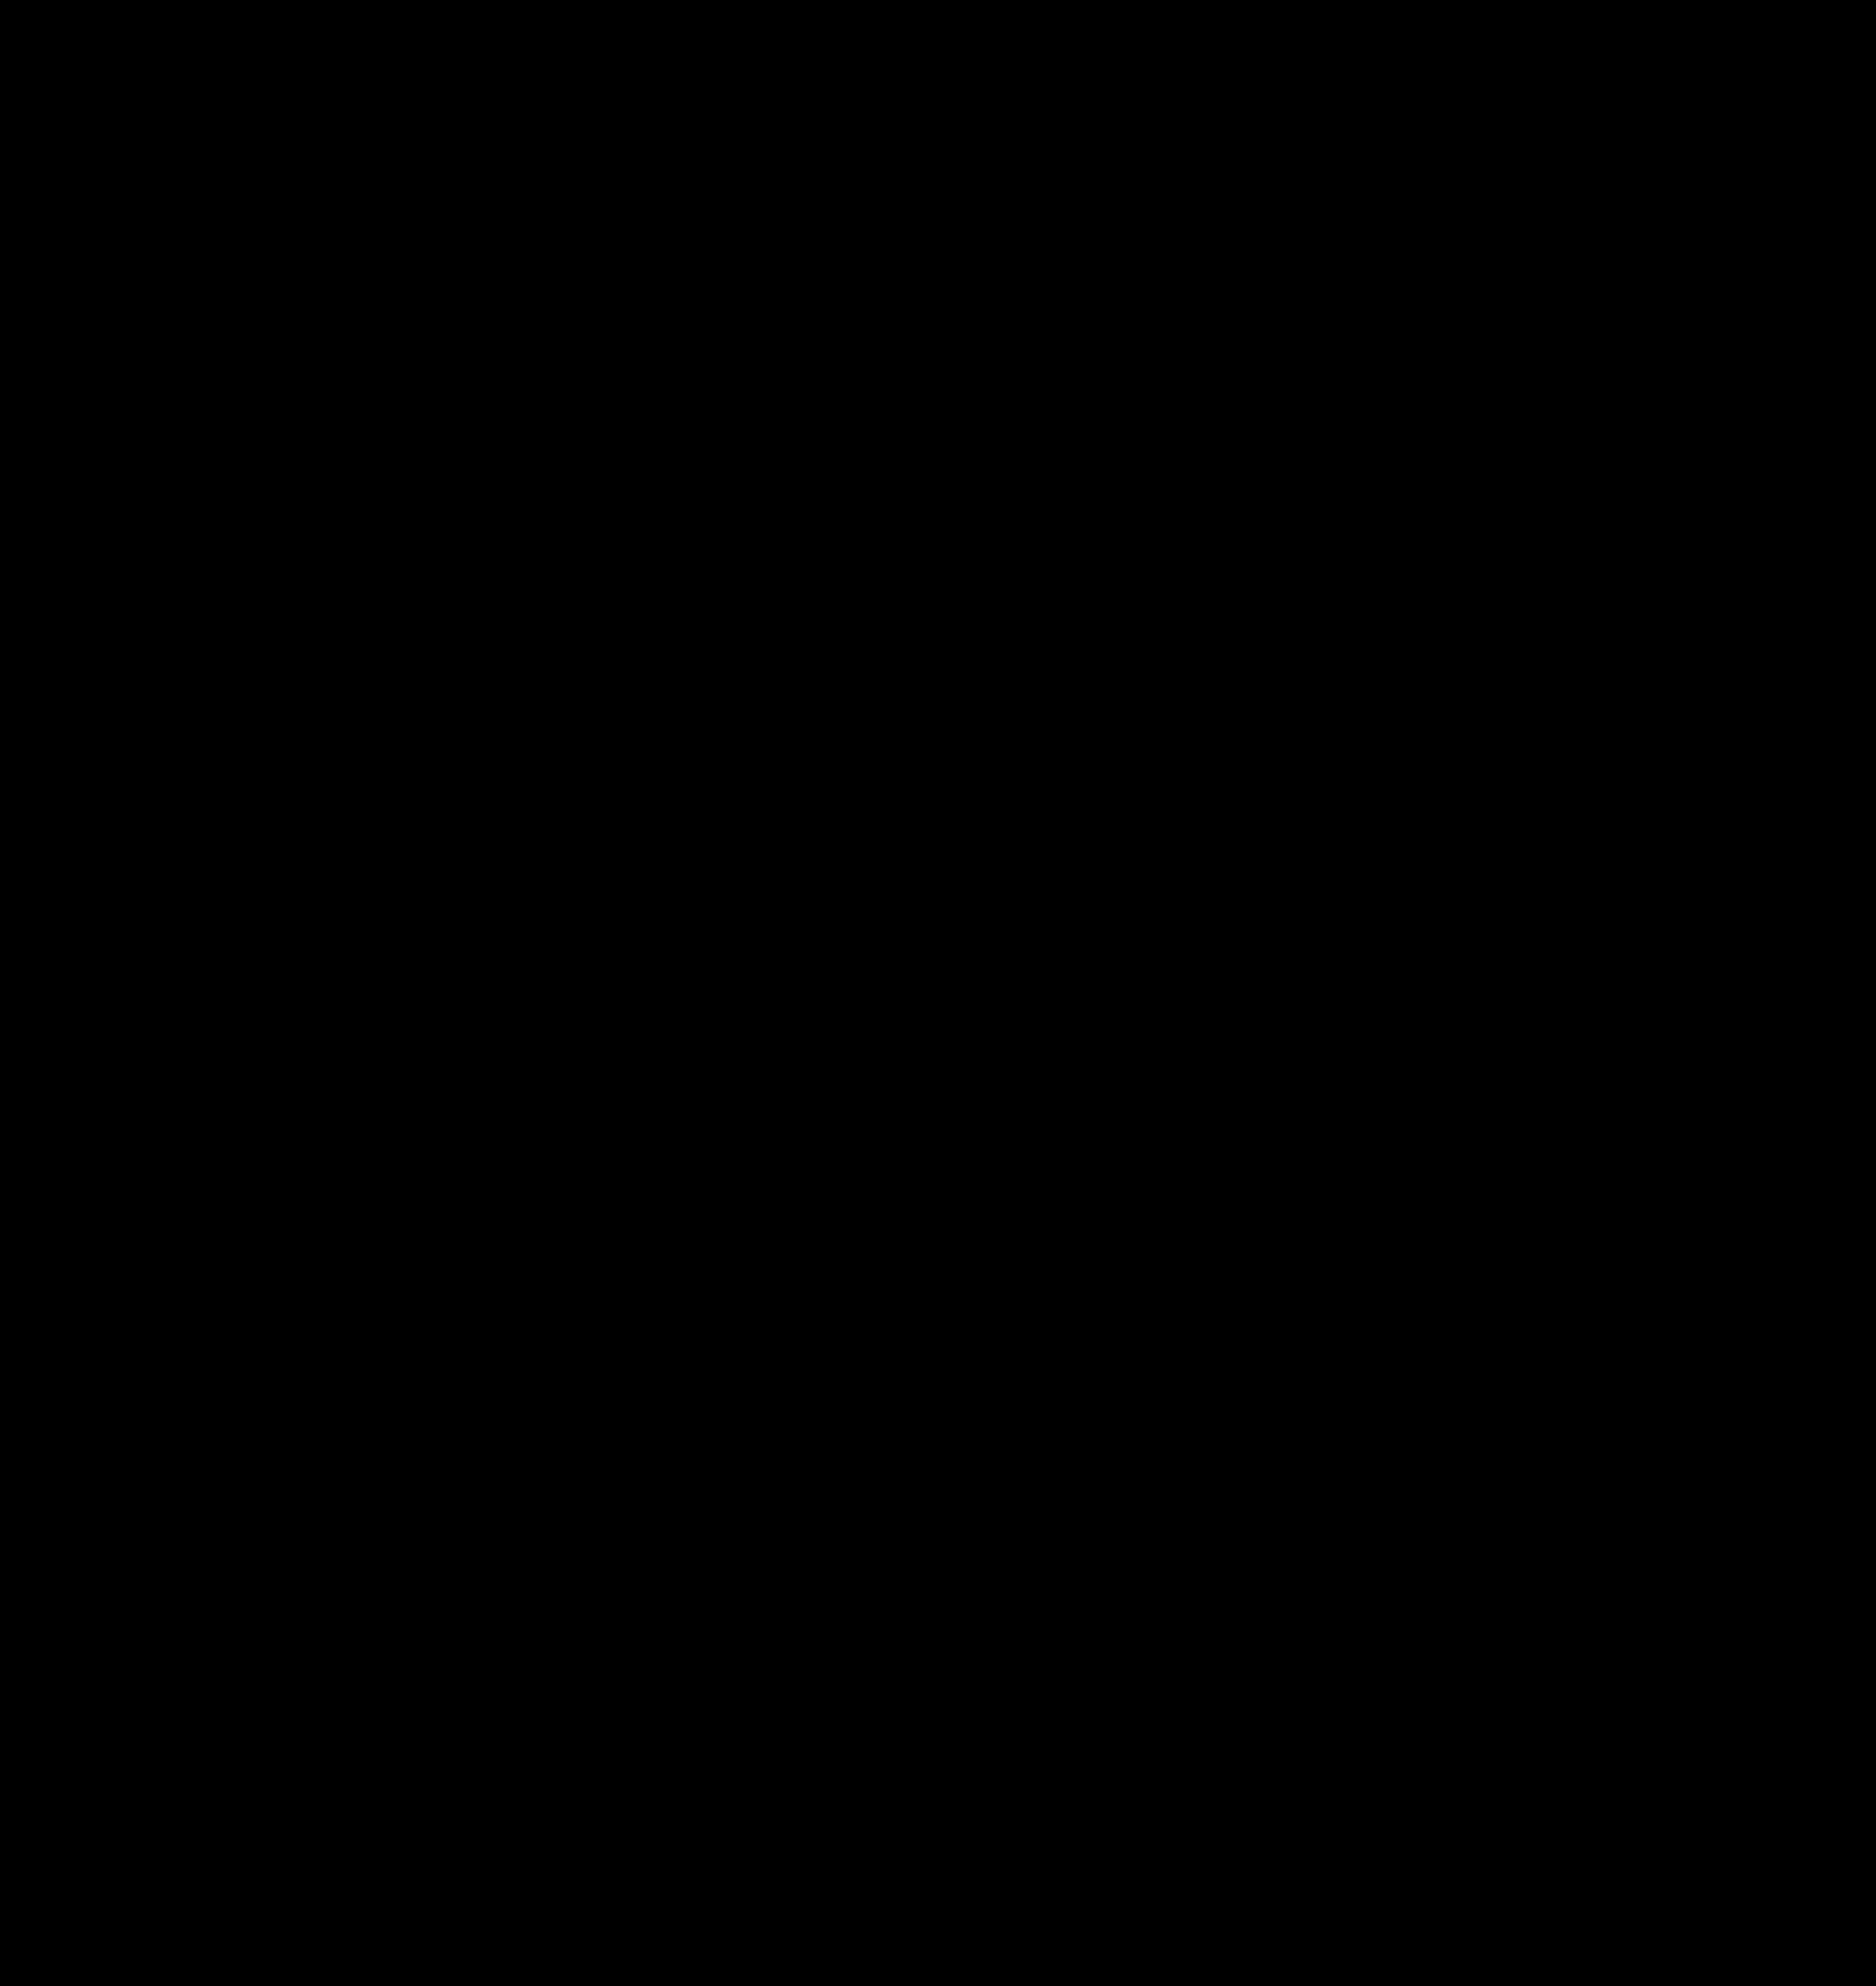 KUCHYŇSKÁ BATERIE SCHOCK LAIOS POLARIS 517000